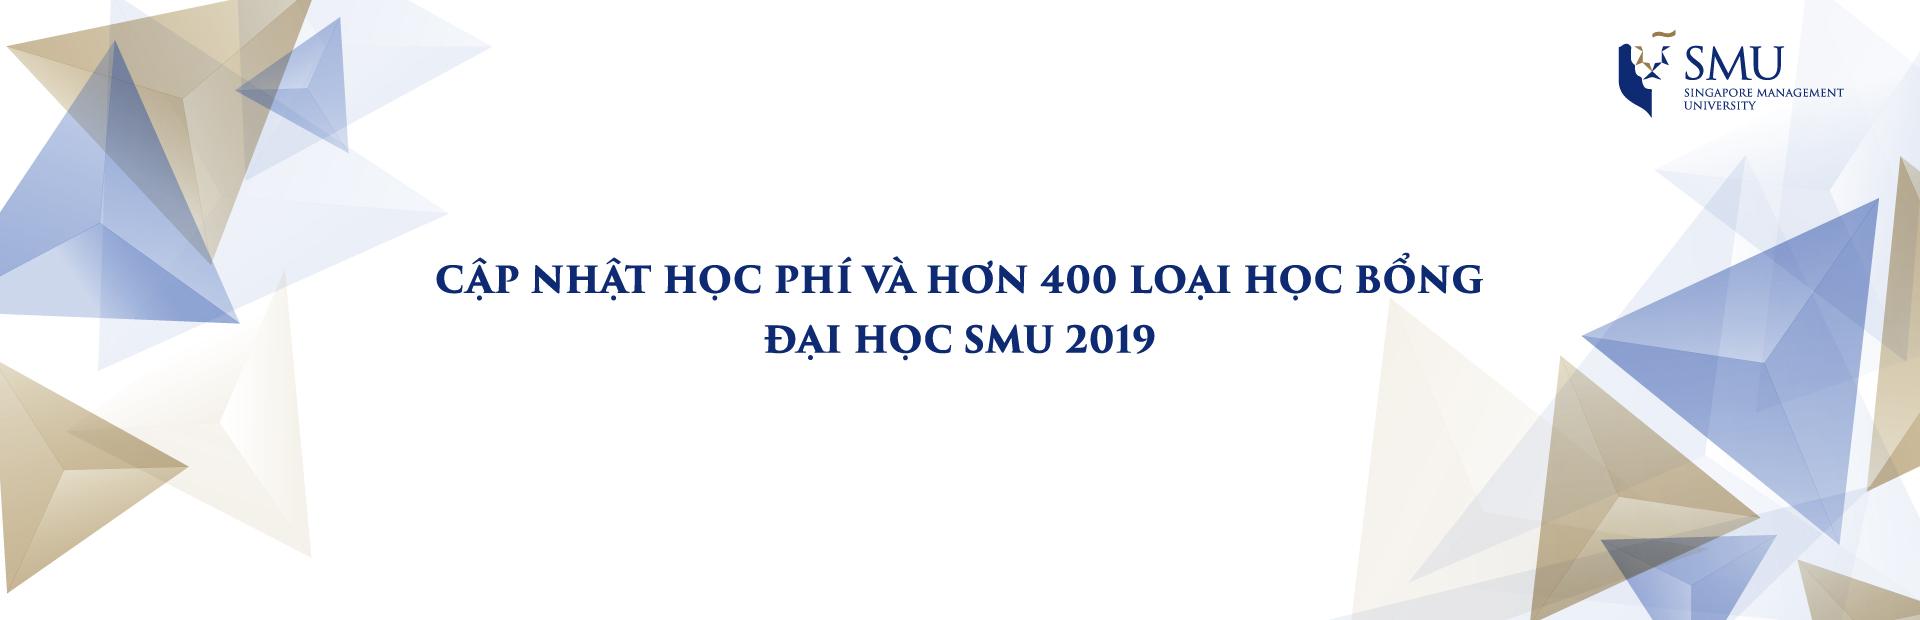 SMU hoc bong